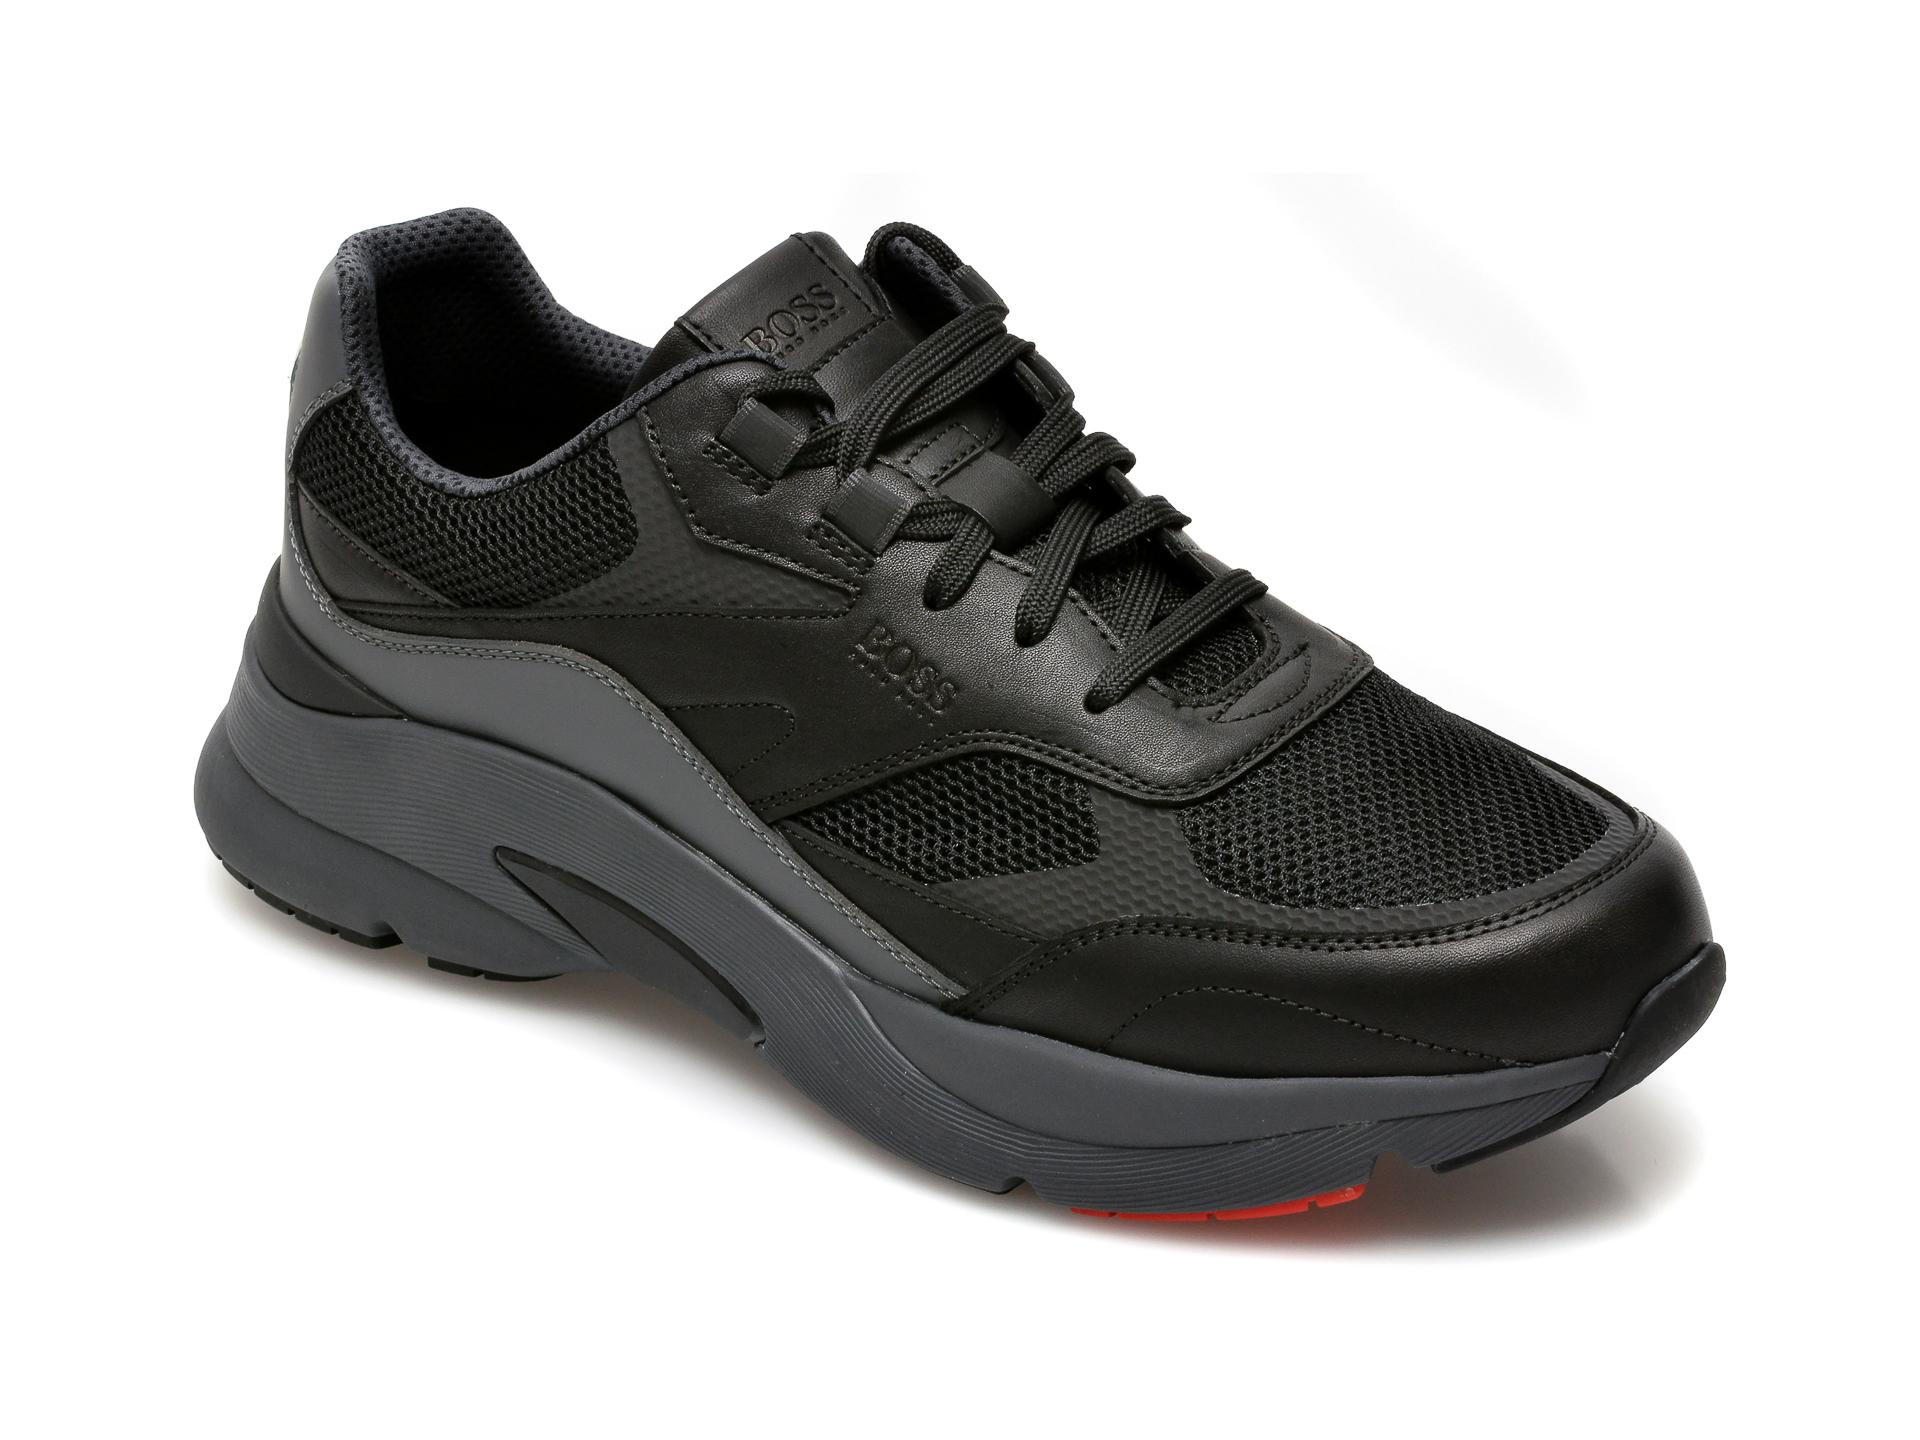 Pantofi sport HUGO BOSS negri, 2049, din material textil si piele naturala imagine